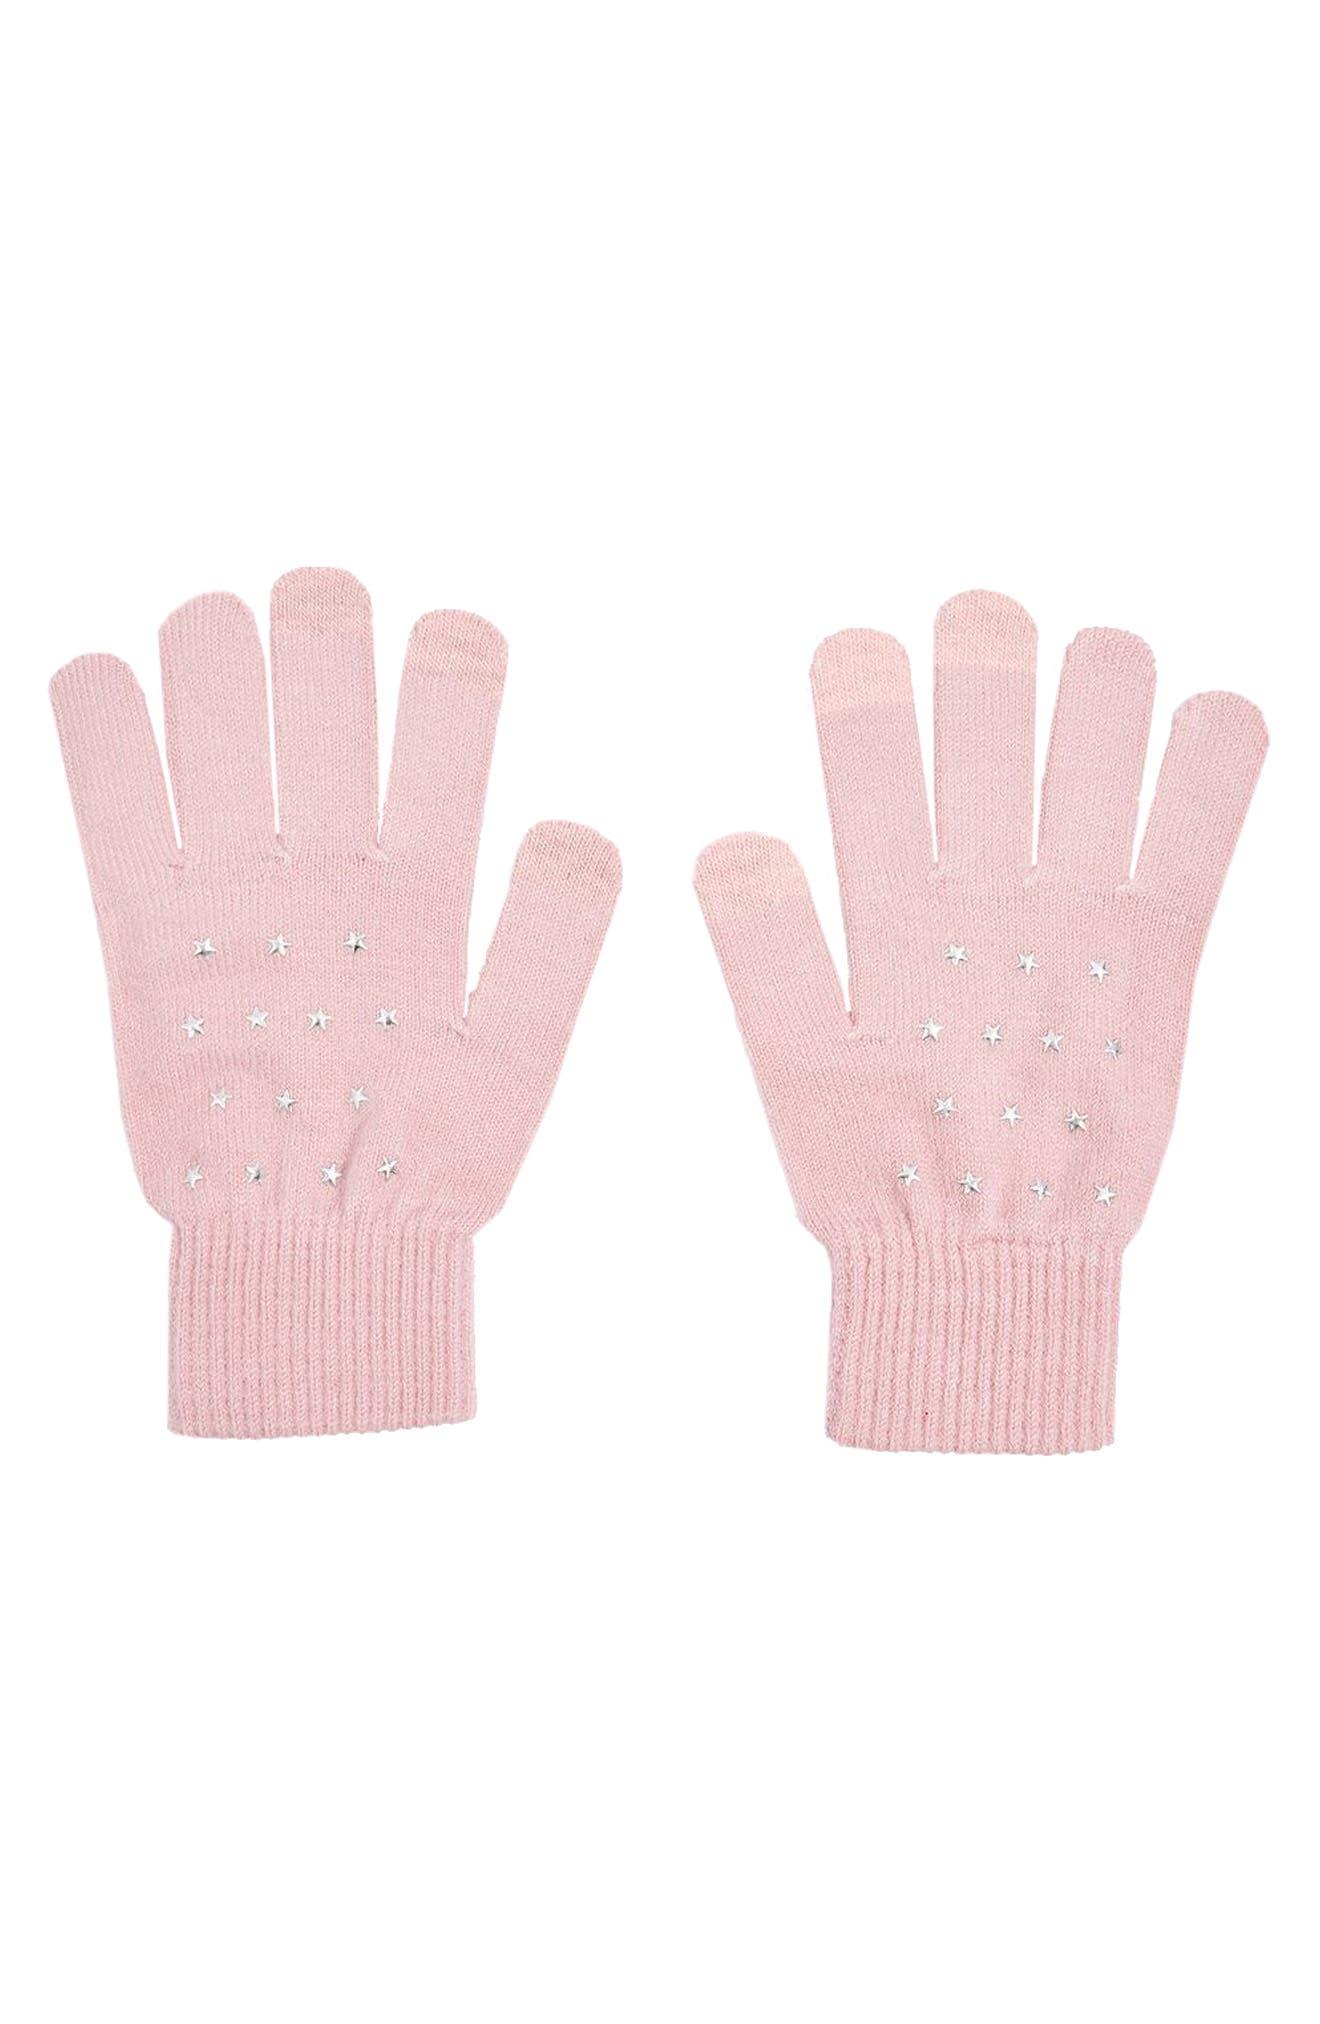 Star Knit Gloves,                             Main thumbnail 1, color,                             Light Pink